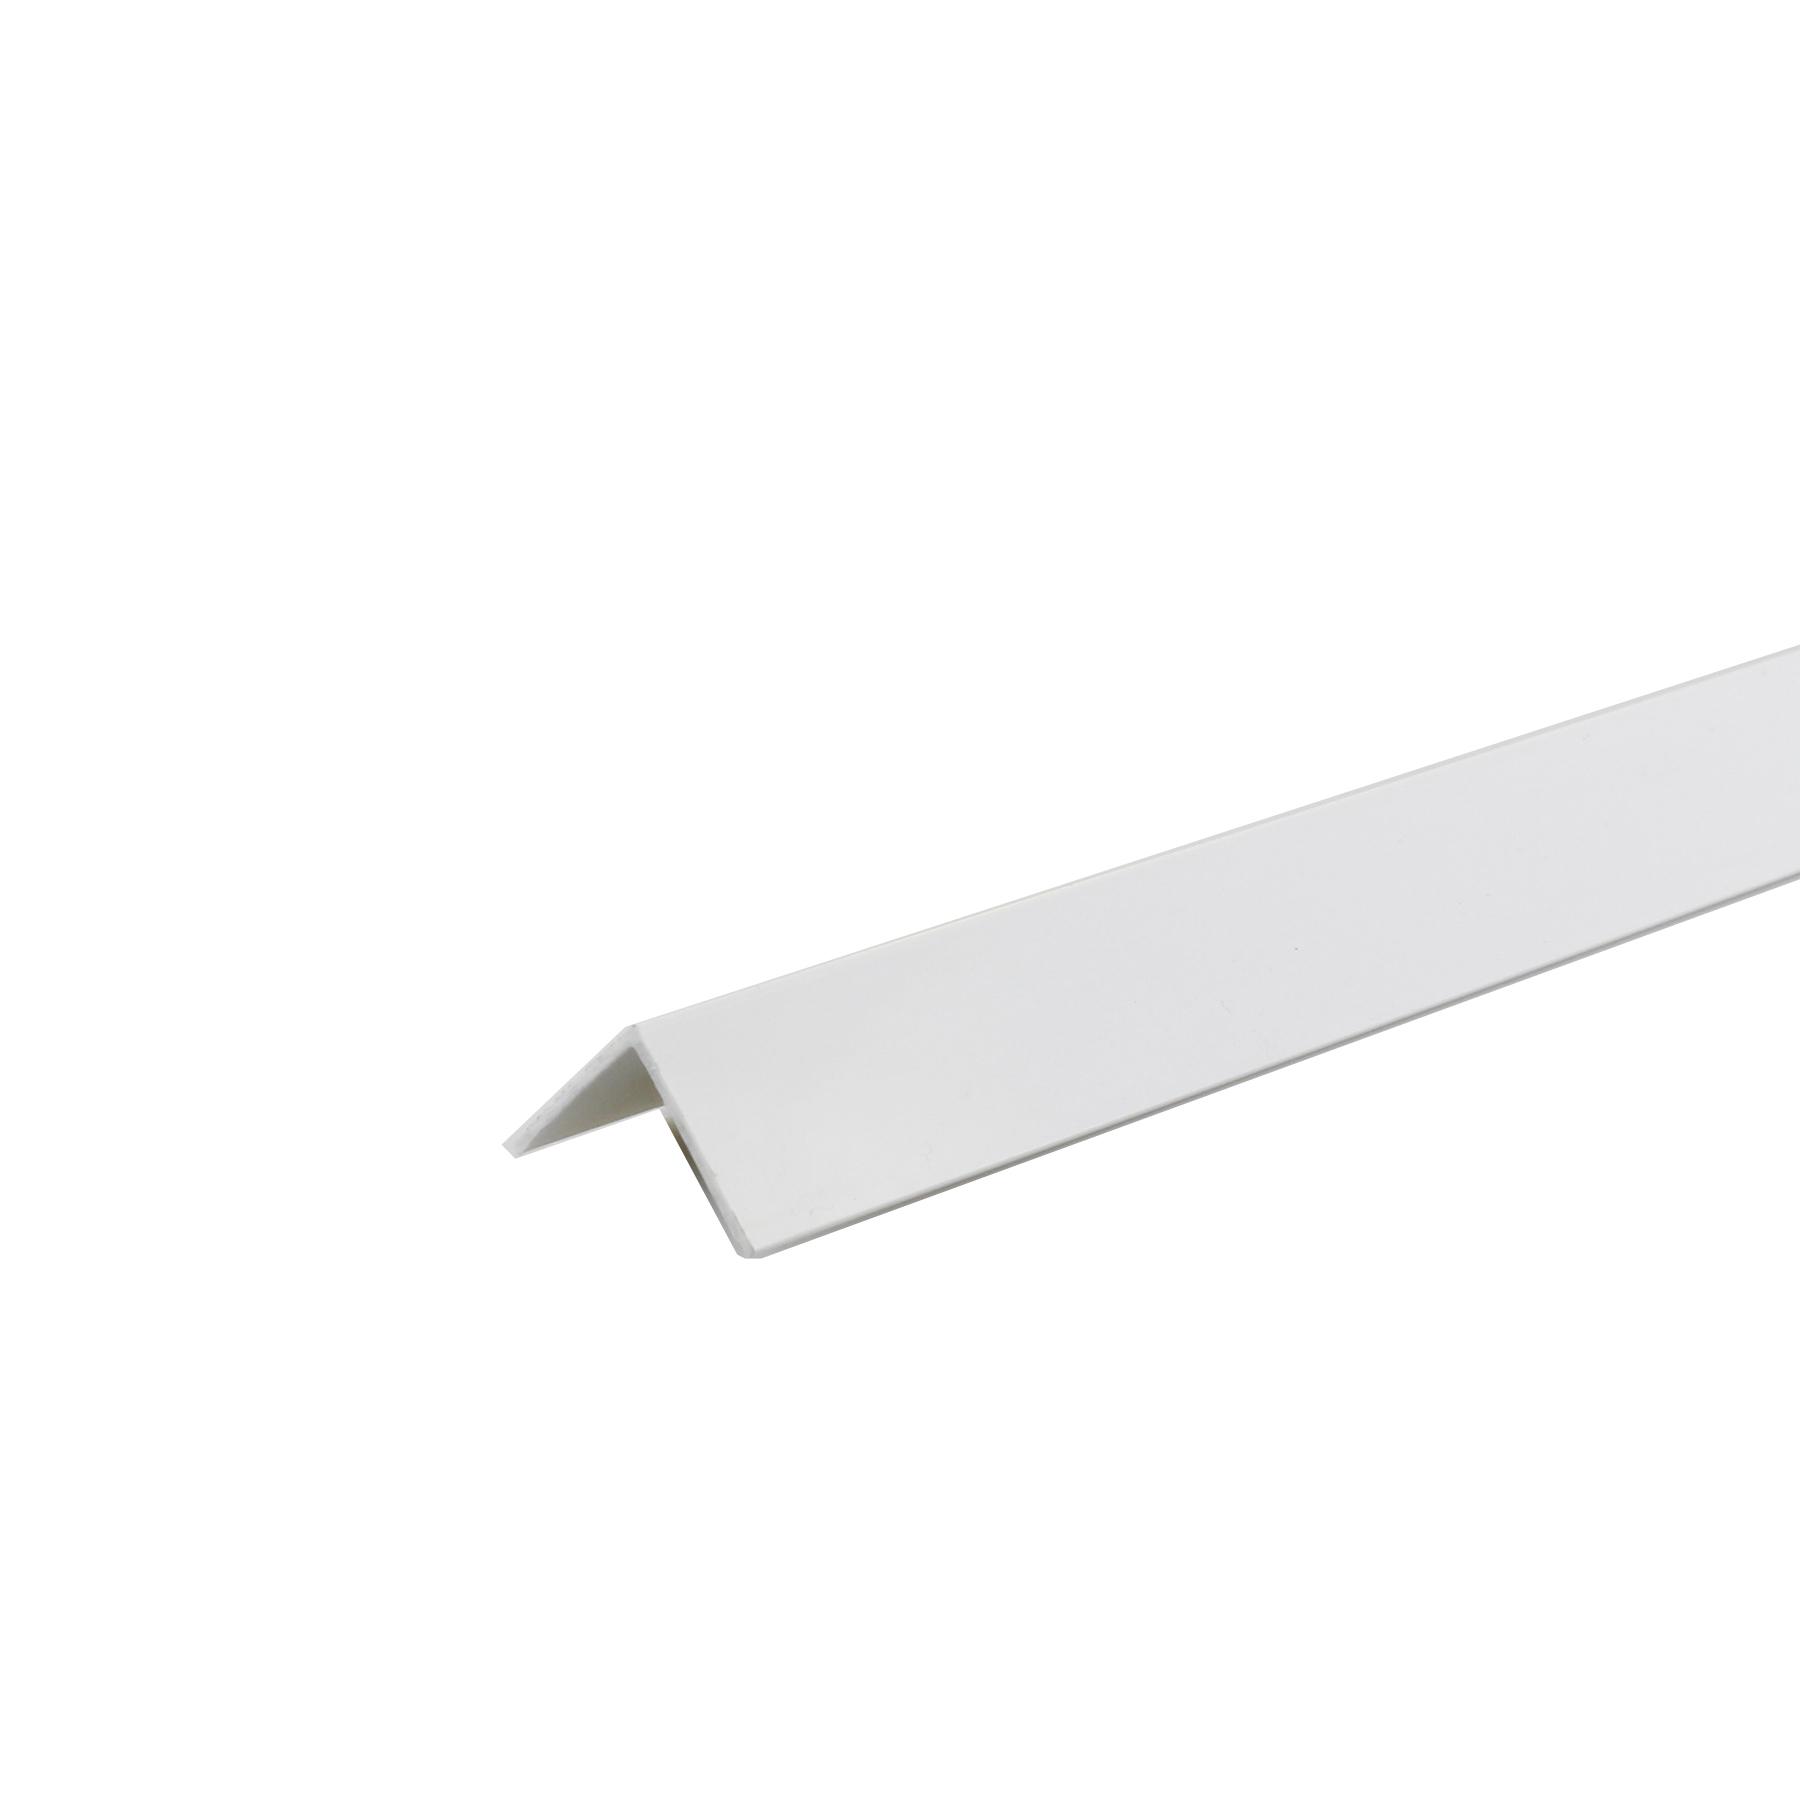 Perfil Plano PVC Porcelana 1m